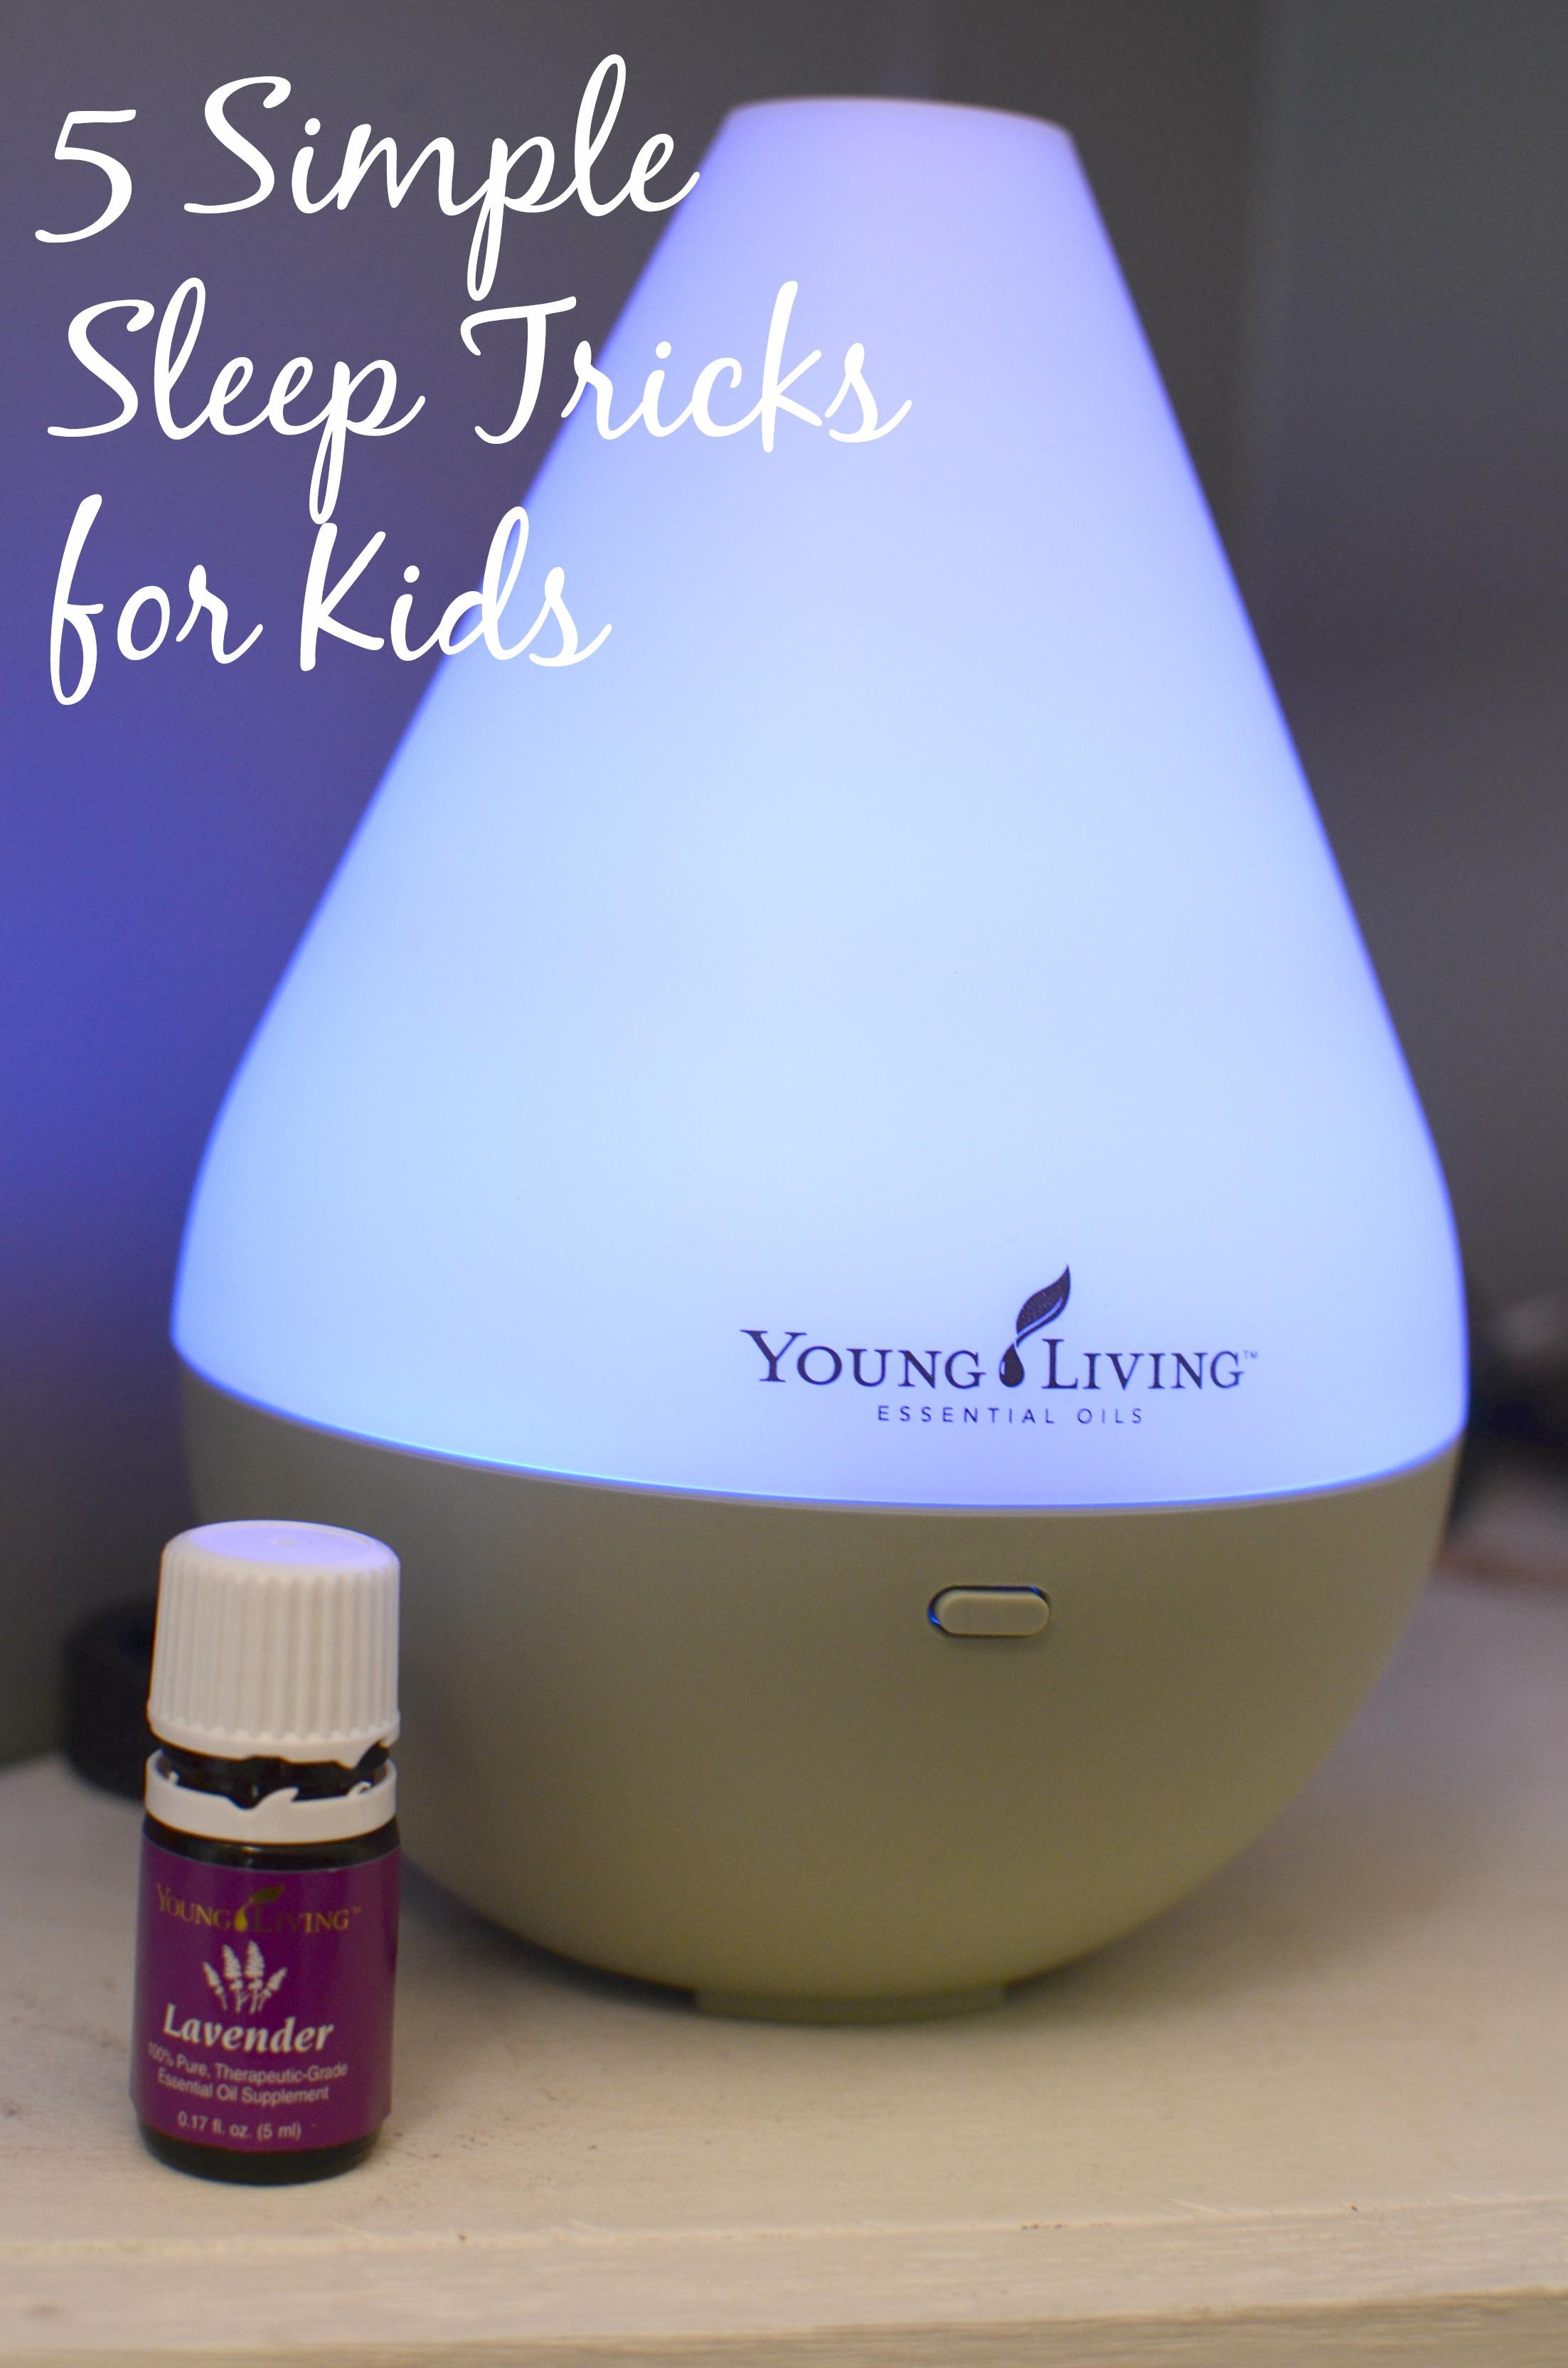 5 simpe sleep tricks for kids